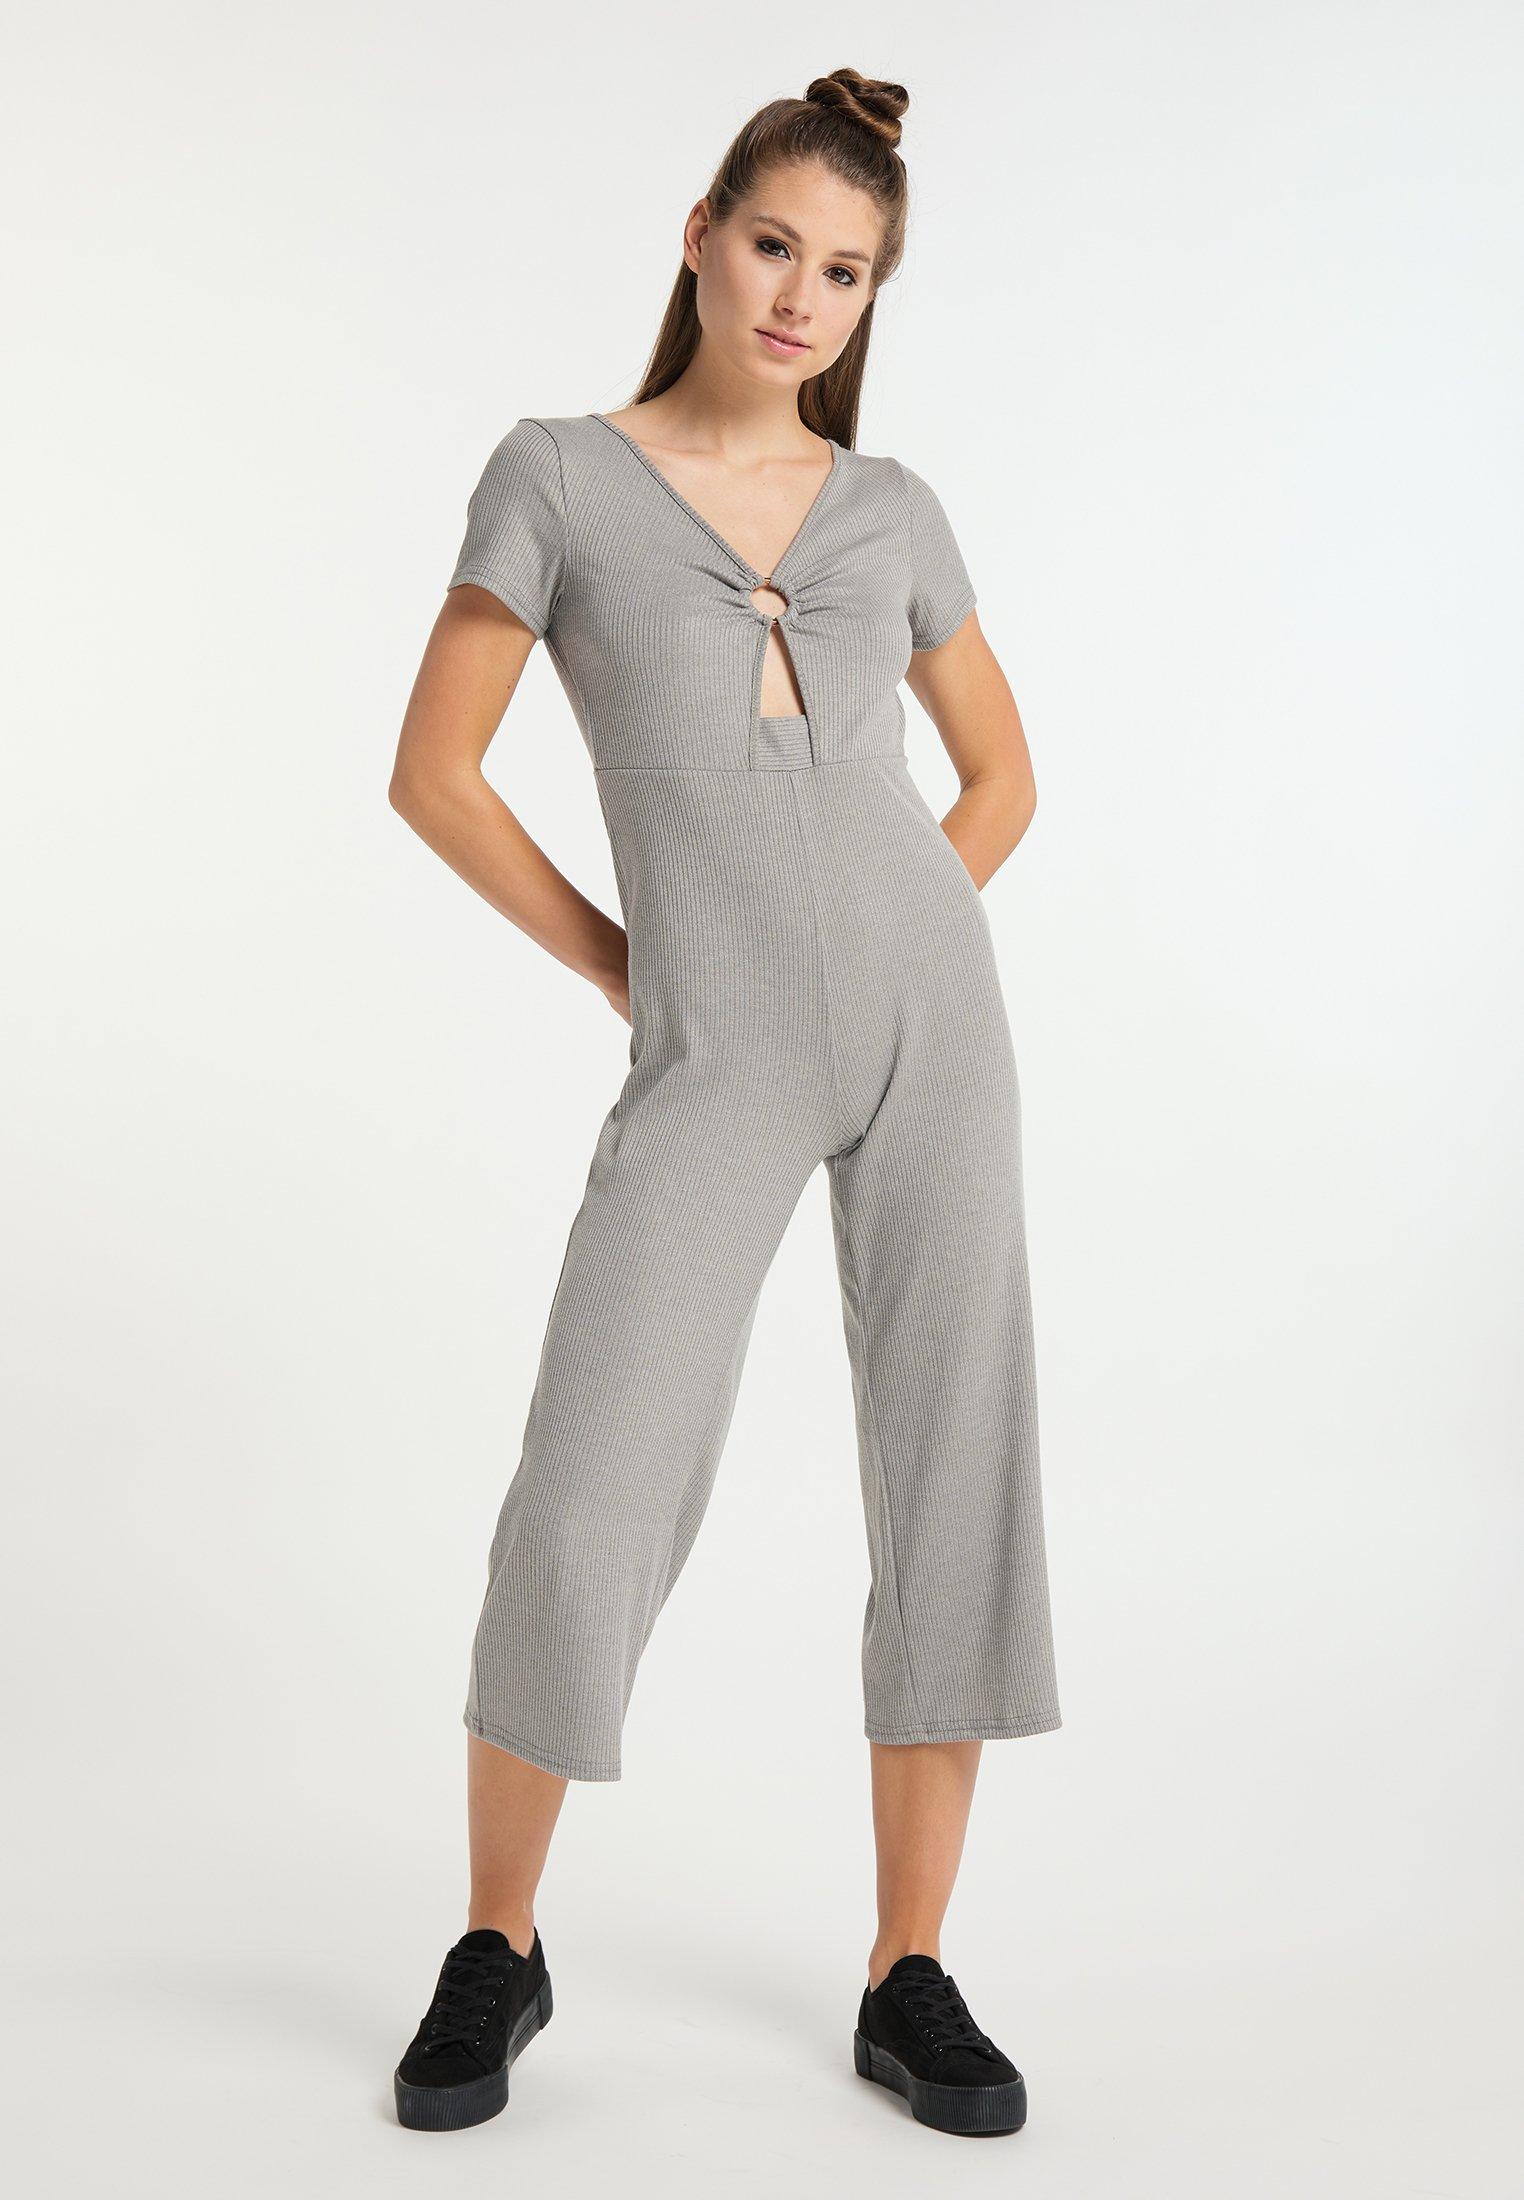 New Fashion Style Of Women's Clothing myMo Jumpsuit grau melange k5sEttpzl